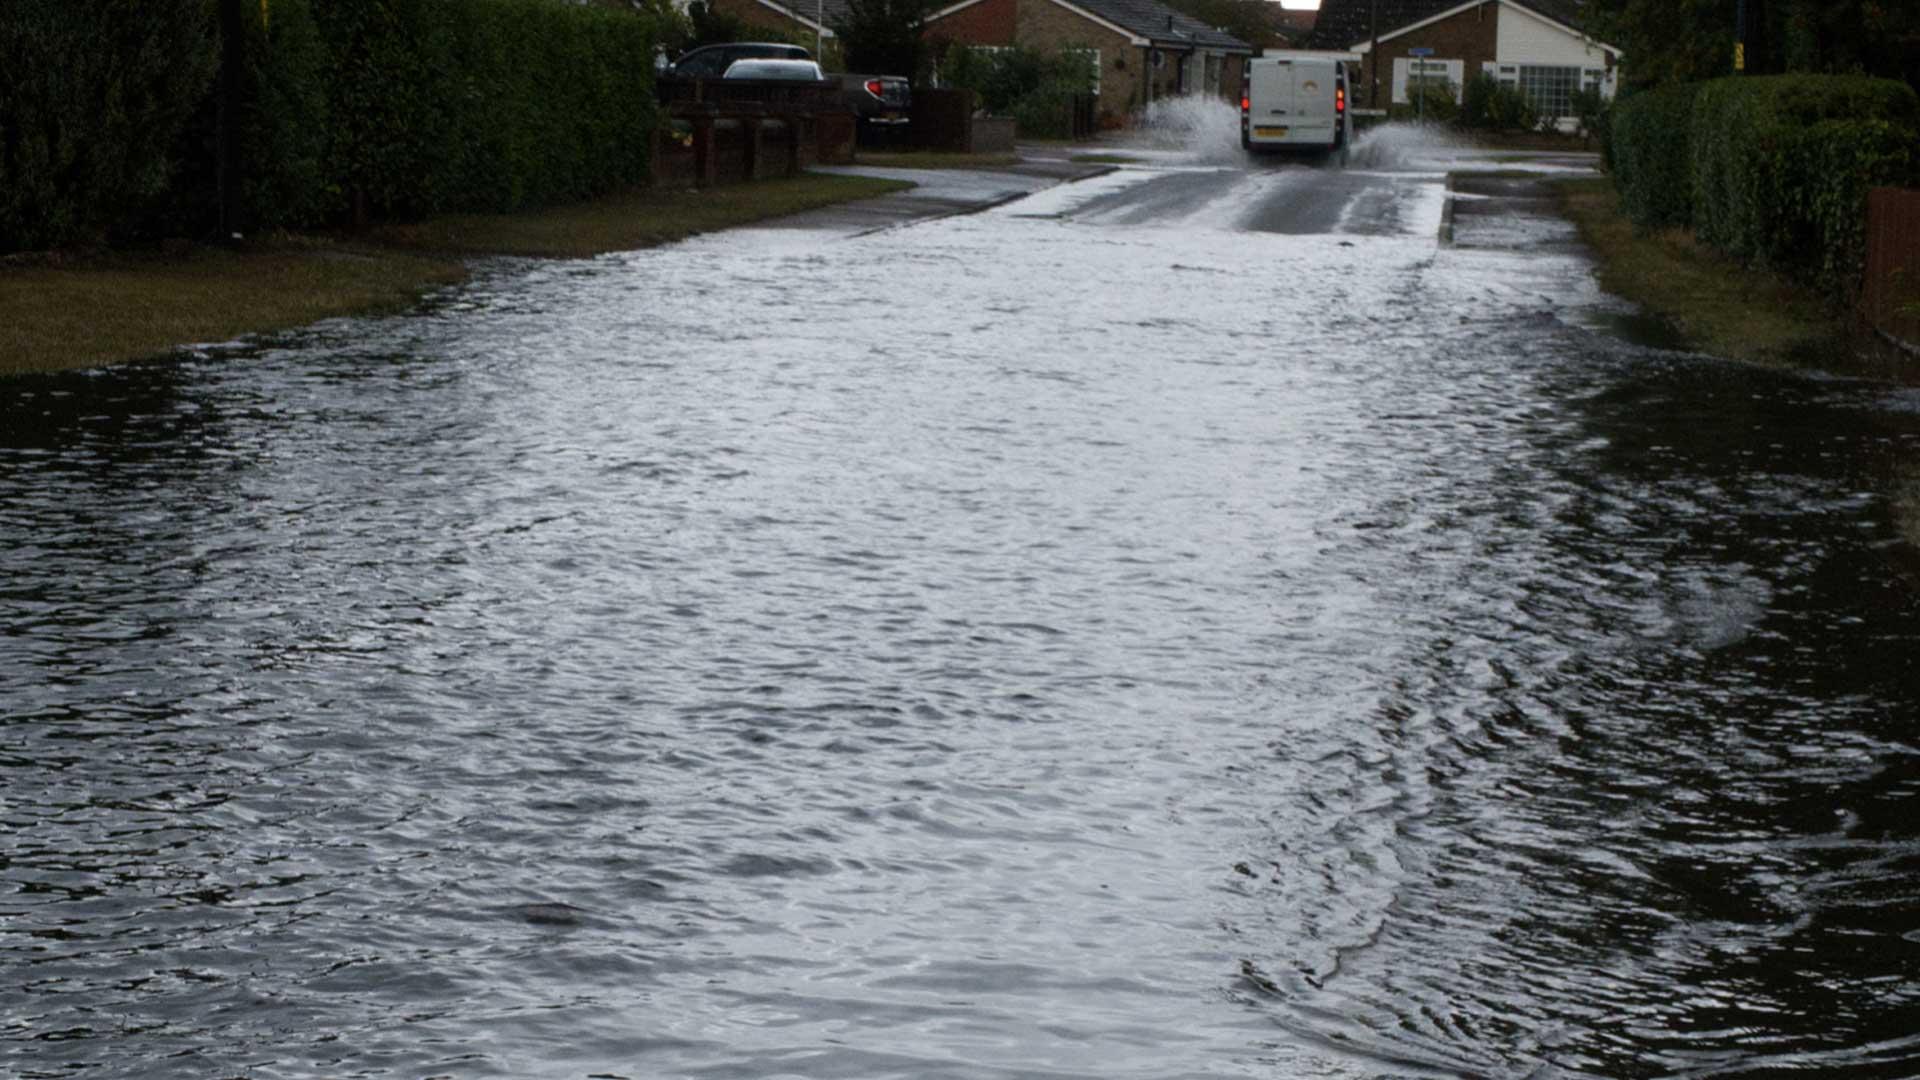 Monkhams Drive flooding